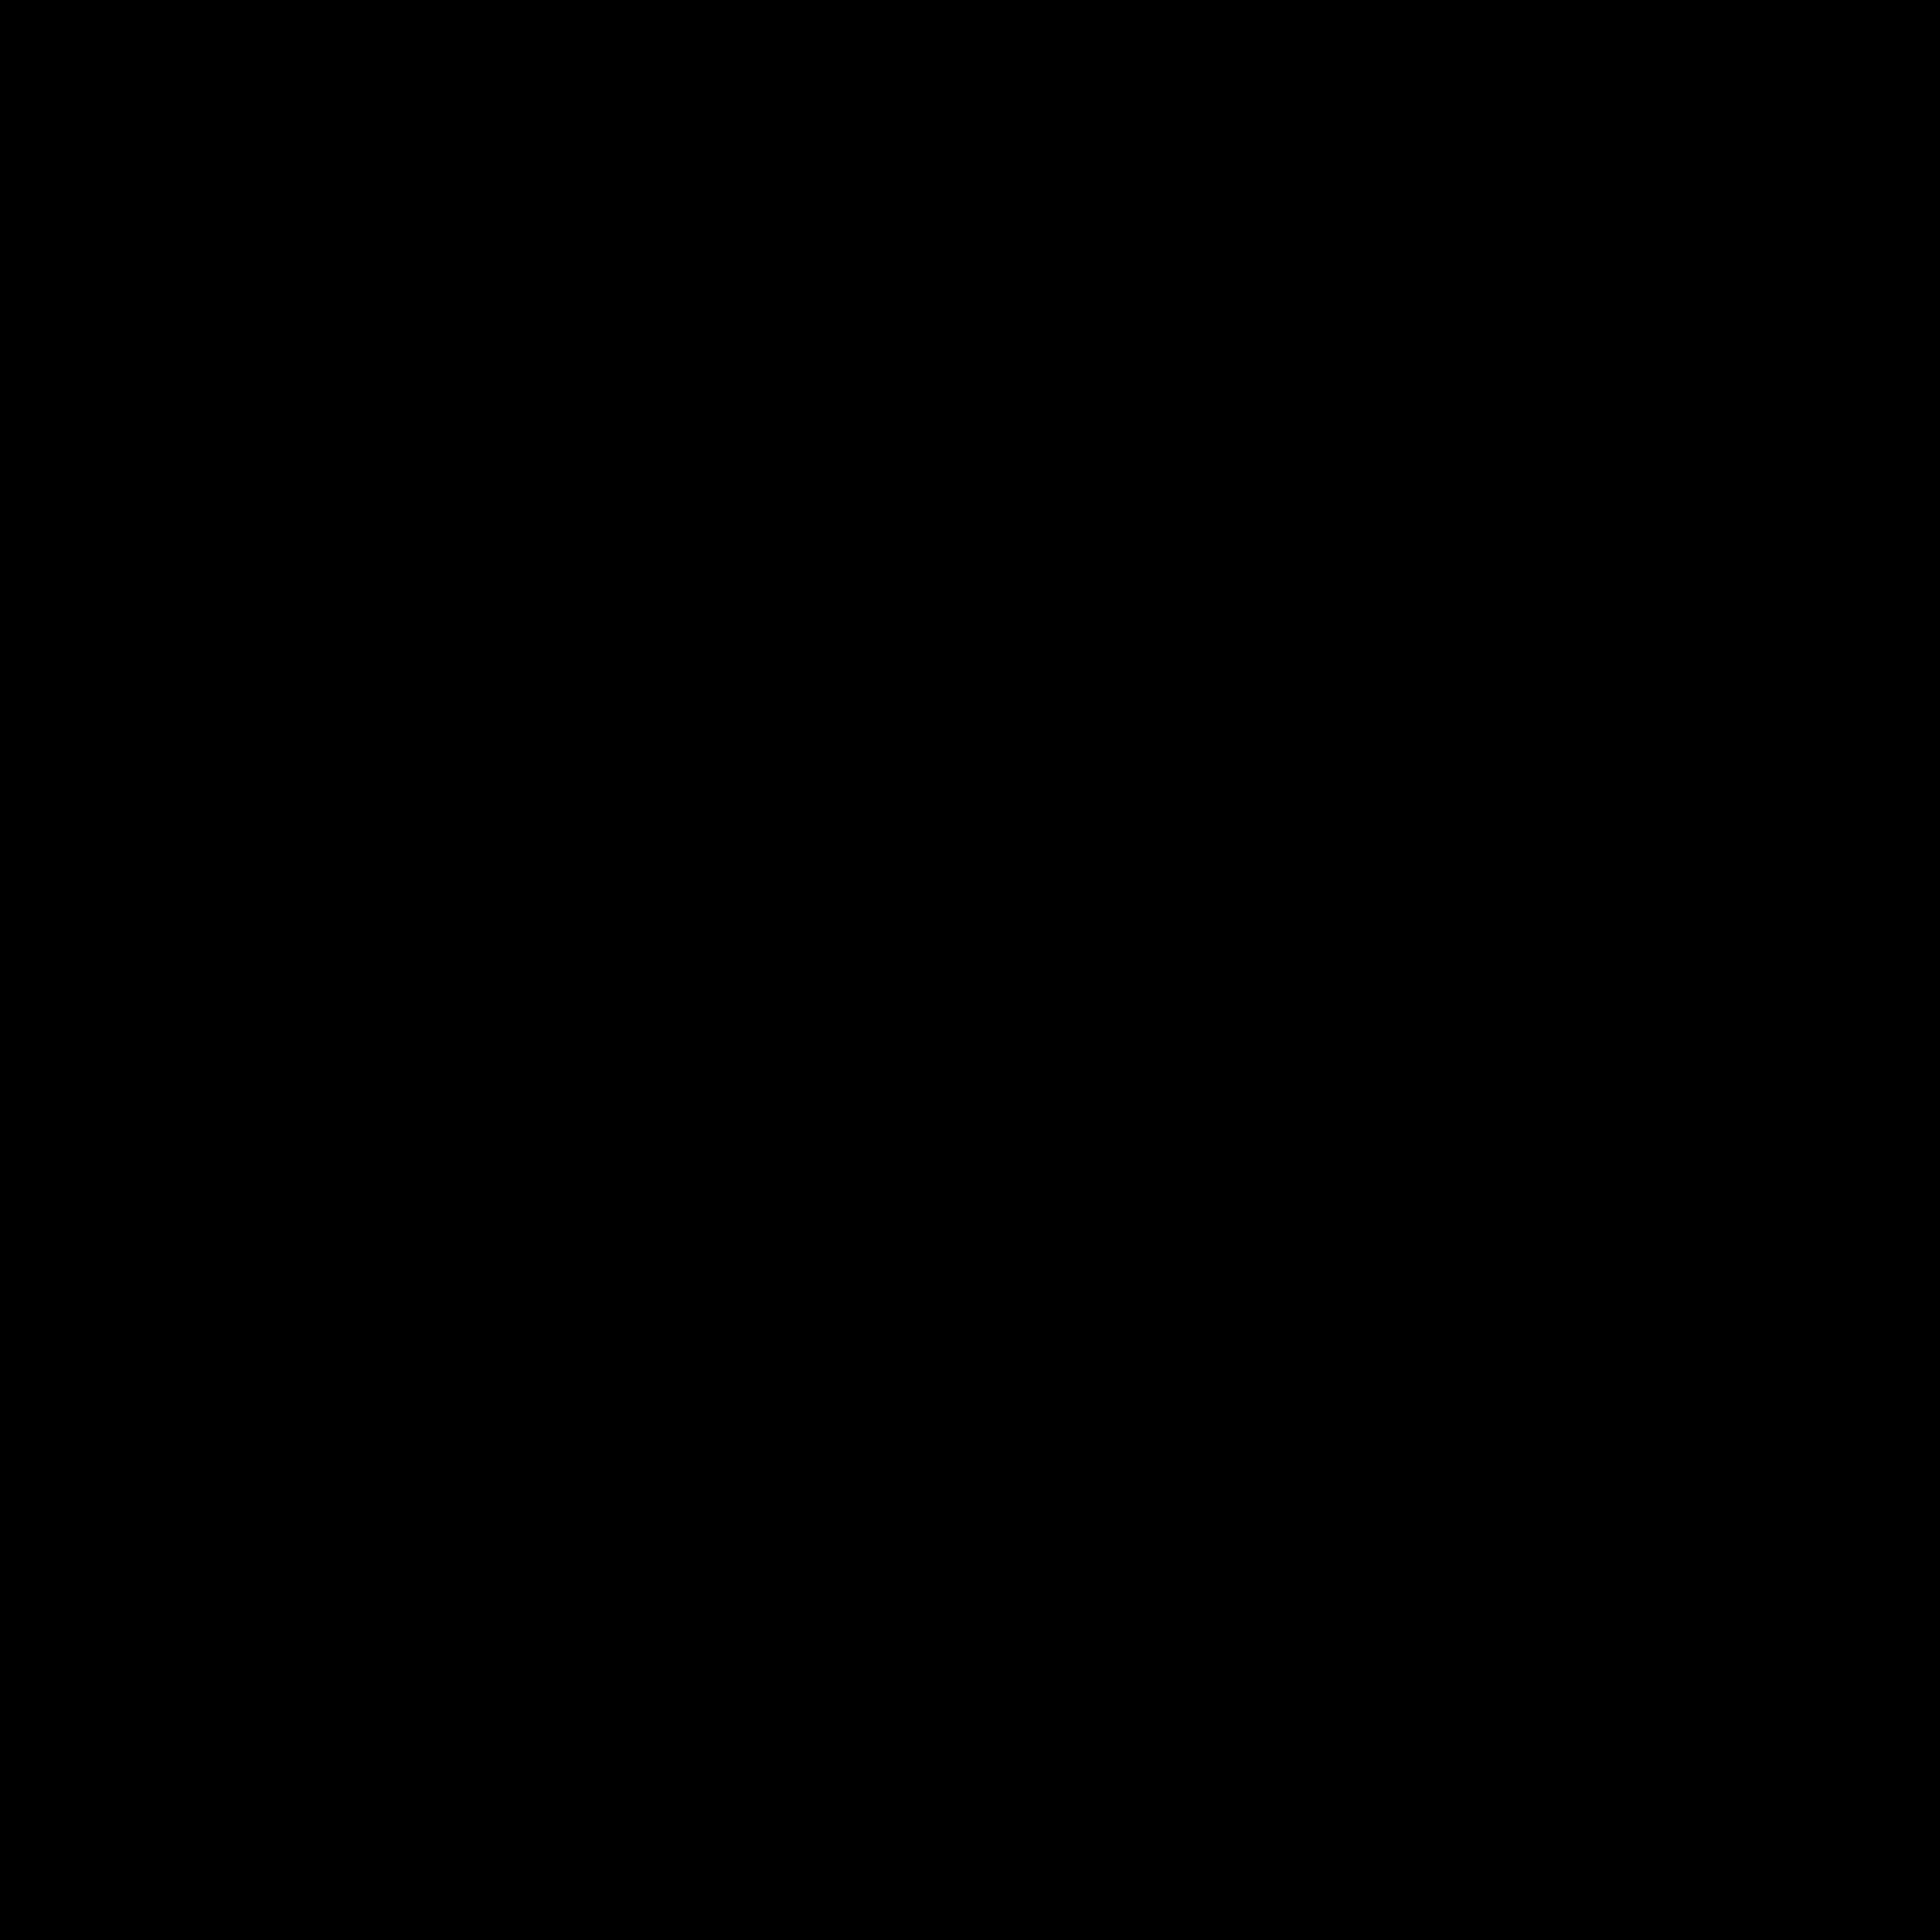 black, hackernews icon